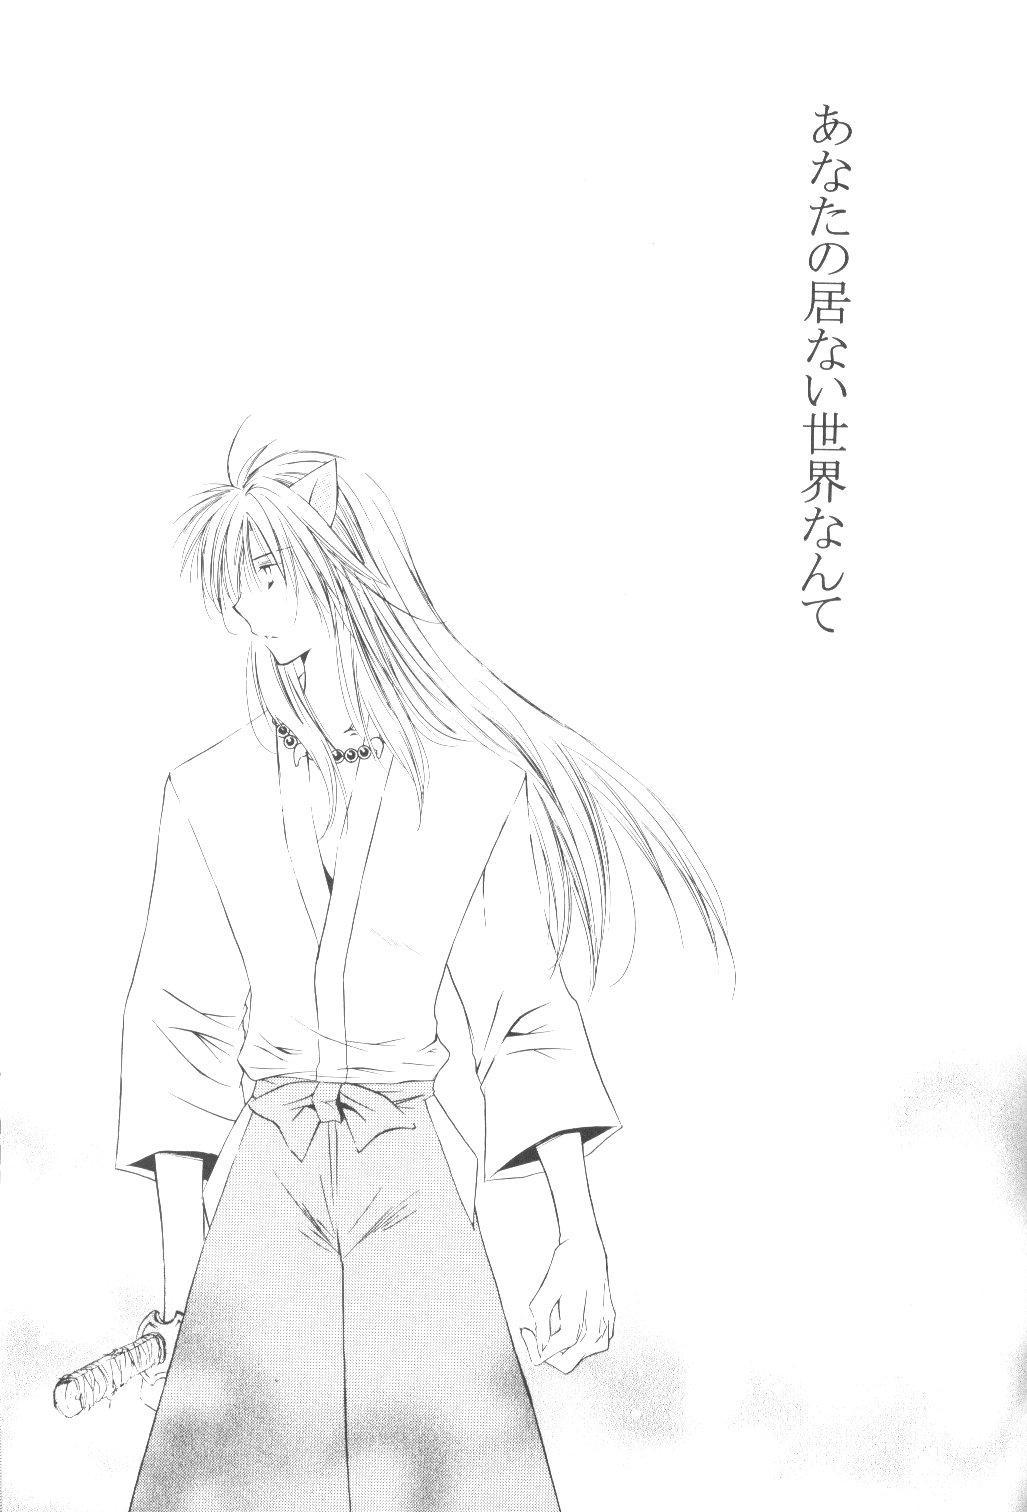 Ryuusei Ryodan 2